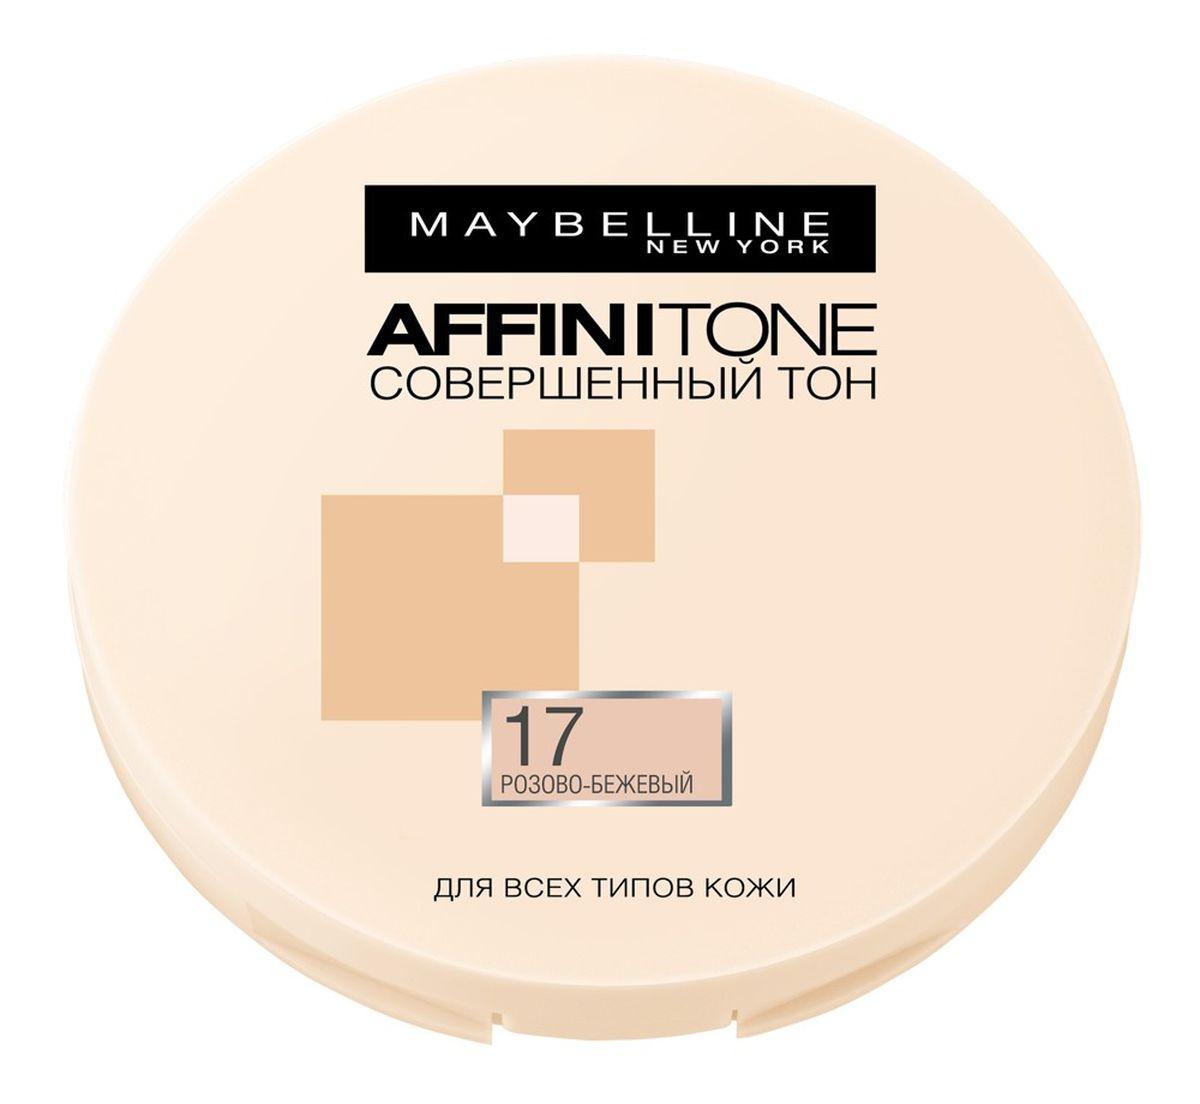 Maybelline New York Пудра для лица Affinitone, выравнивающая и матирующая, оттенок 17 розово-беж, 9 г